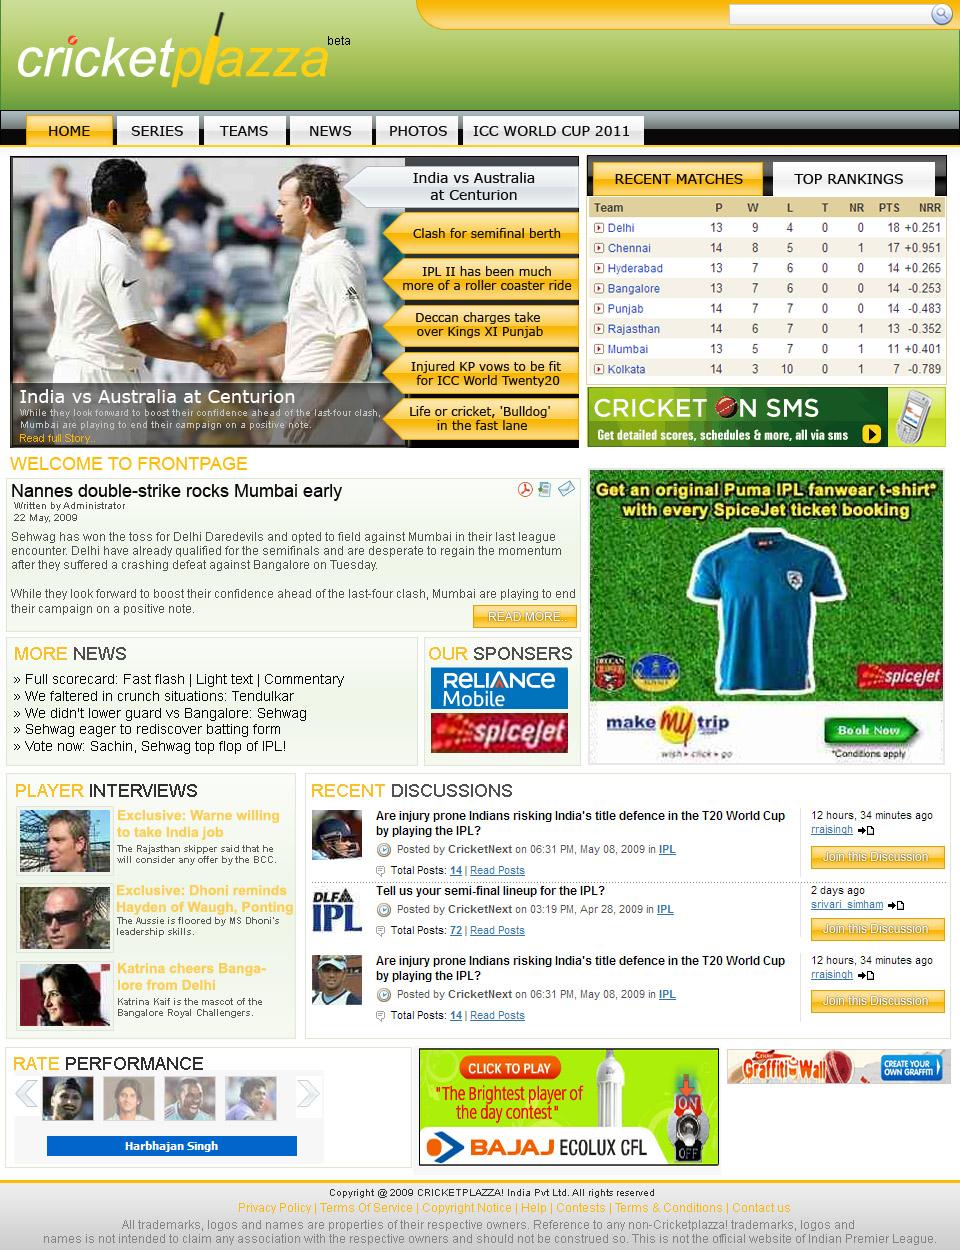 cricket news website template by baltejsingh on deviantart. Black Bedroom Furniture Sets. Home Design Ideas